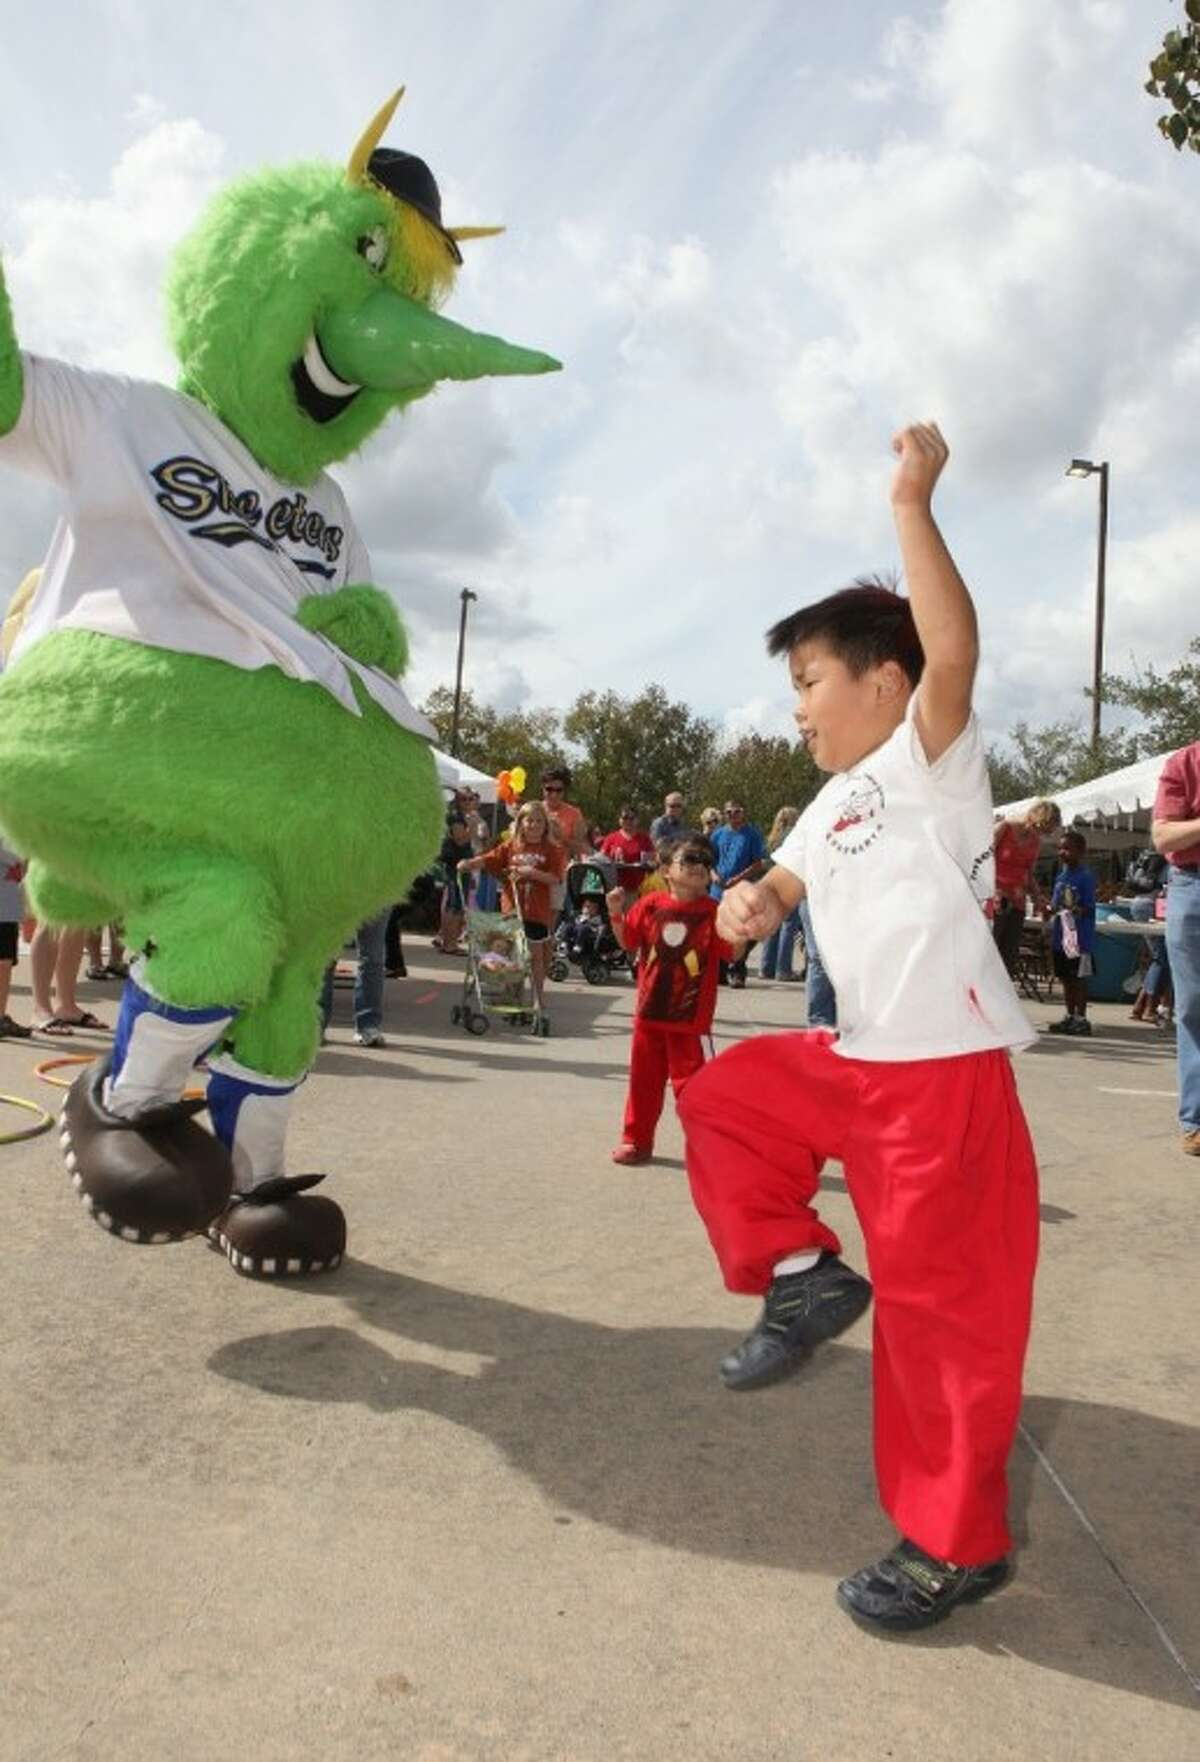 Kyle Lew, 6, of Missouri City dances Gangnam Style with Sugar Land Skeeters mascot Swatson at the First United Methodist Church Missouri City Fall Festival on Nov. 10.